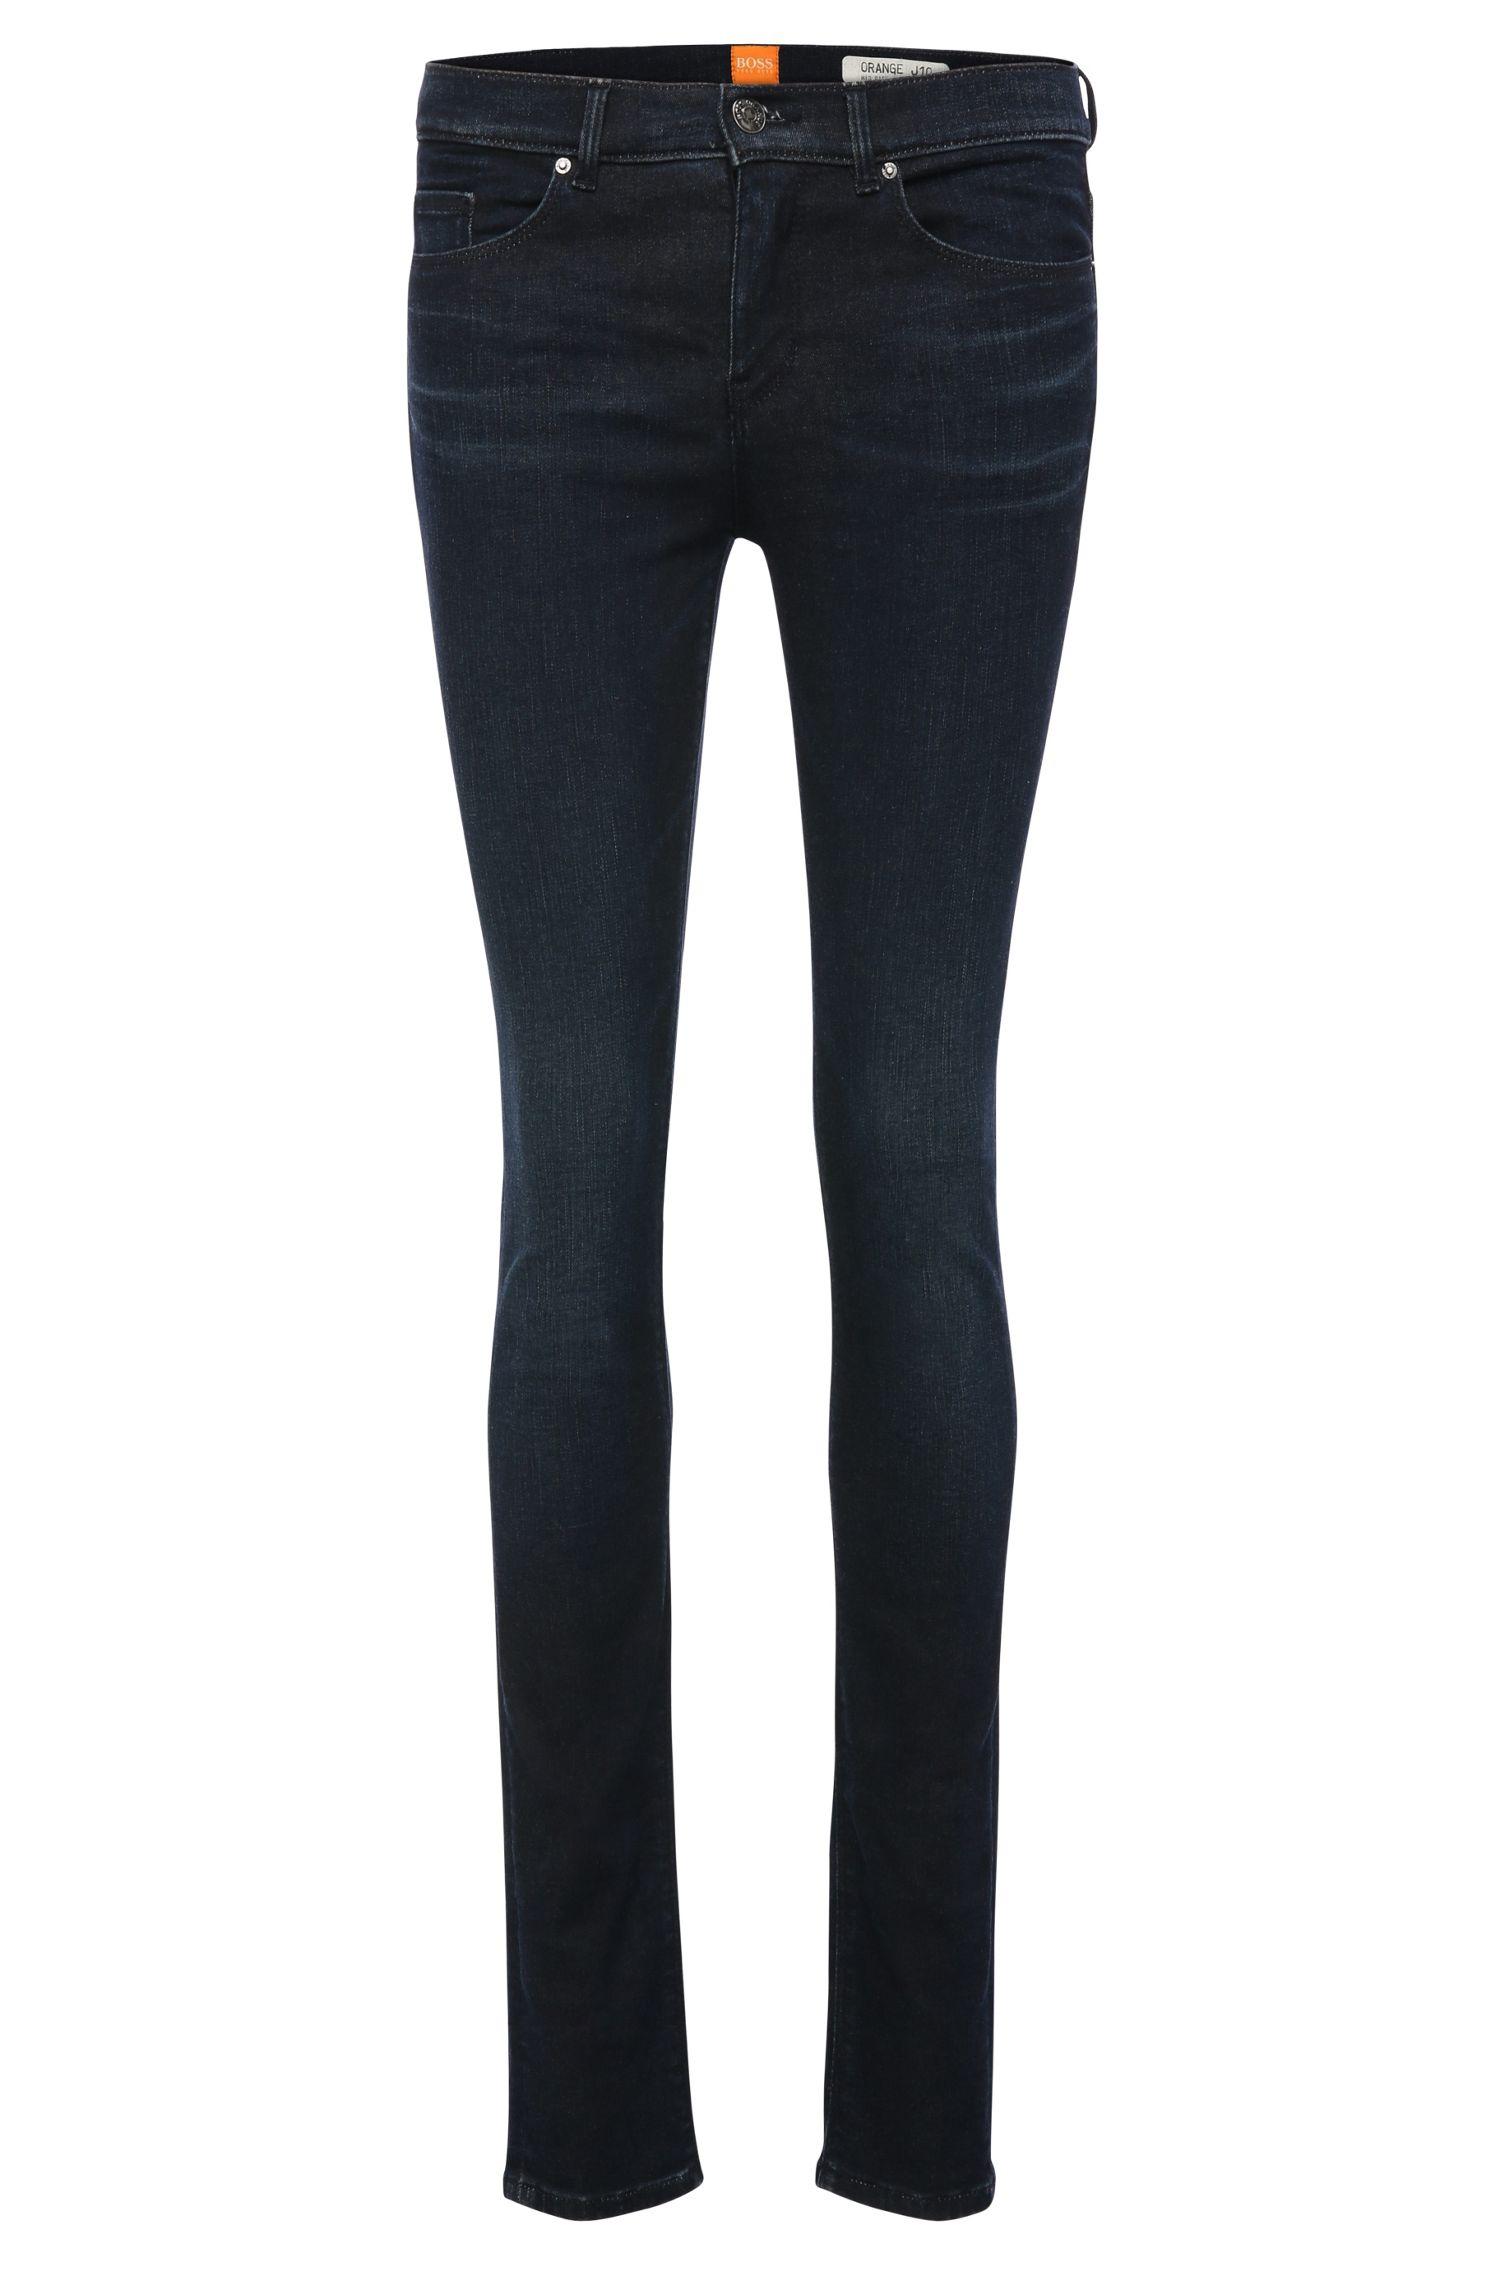 'OrangeJ10' | Stretch Cotton Blend Mid-Rise Jeans